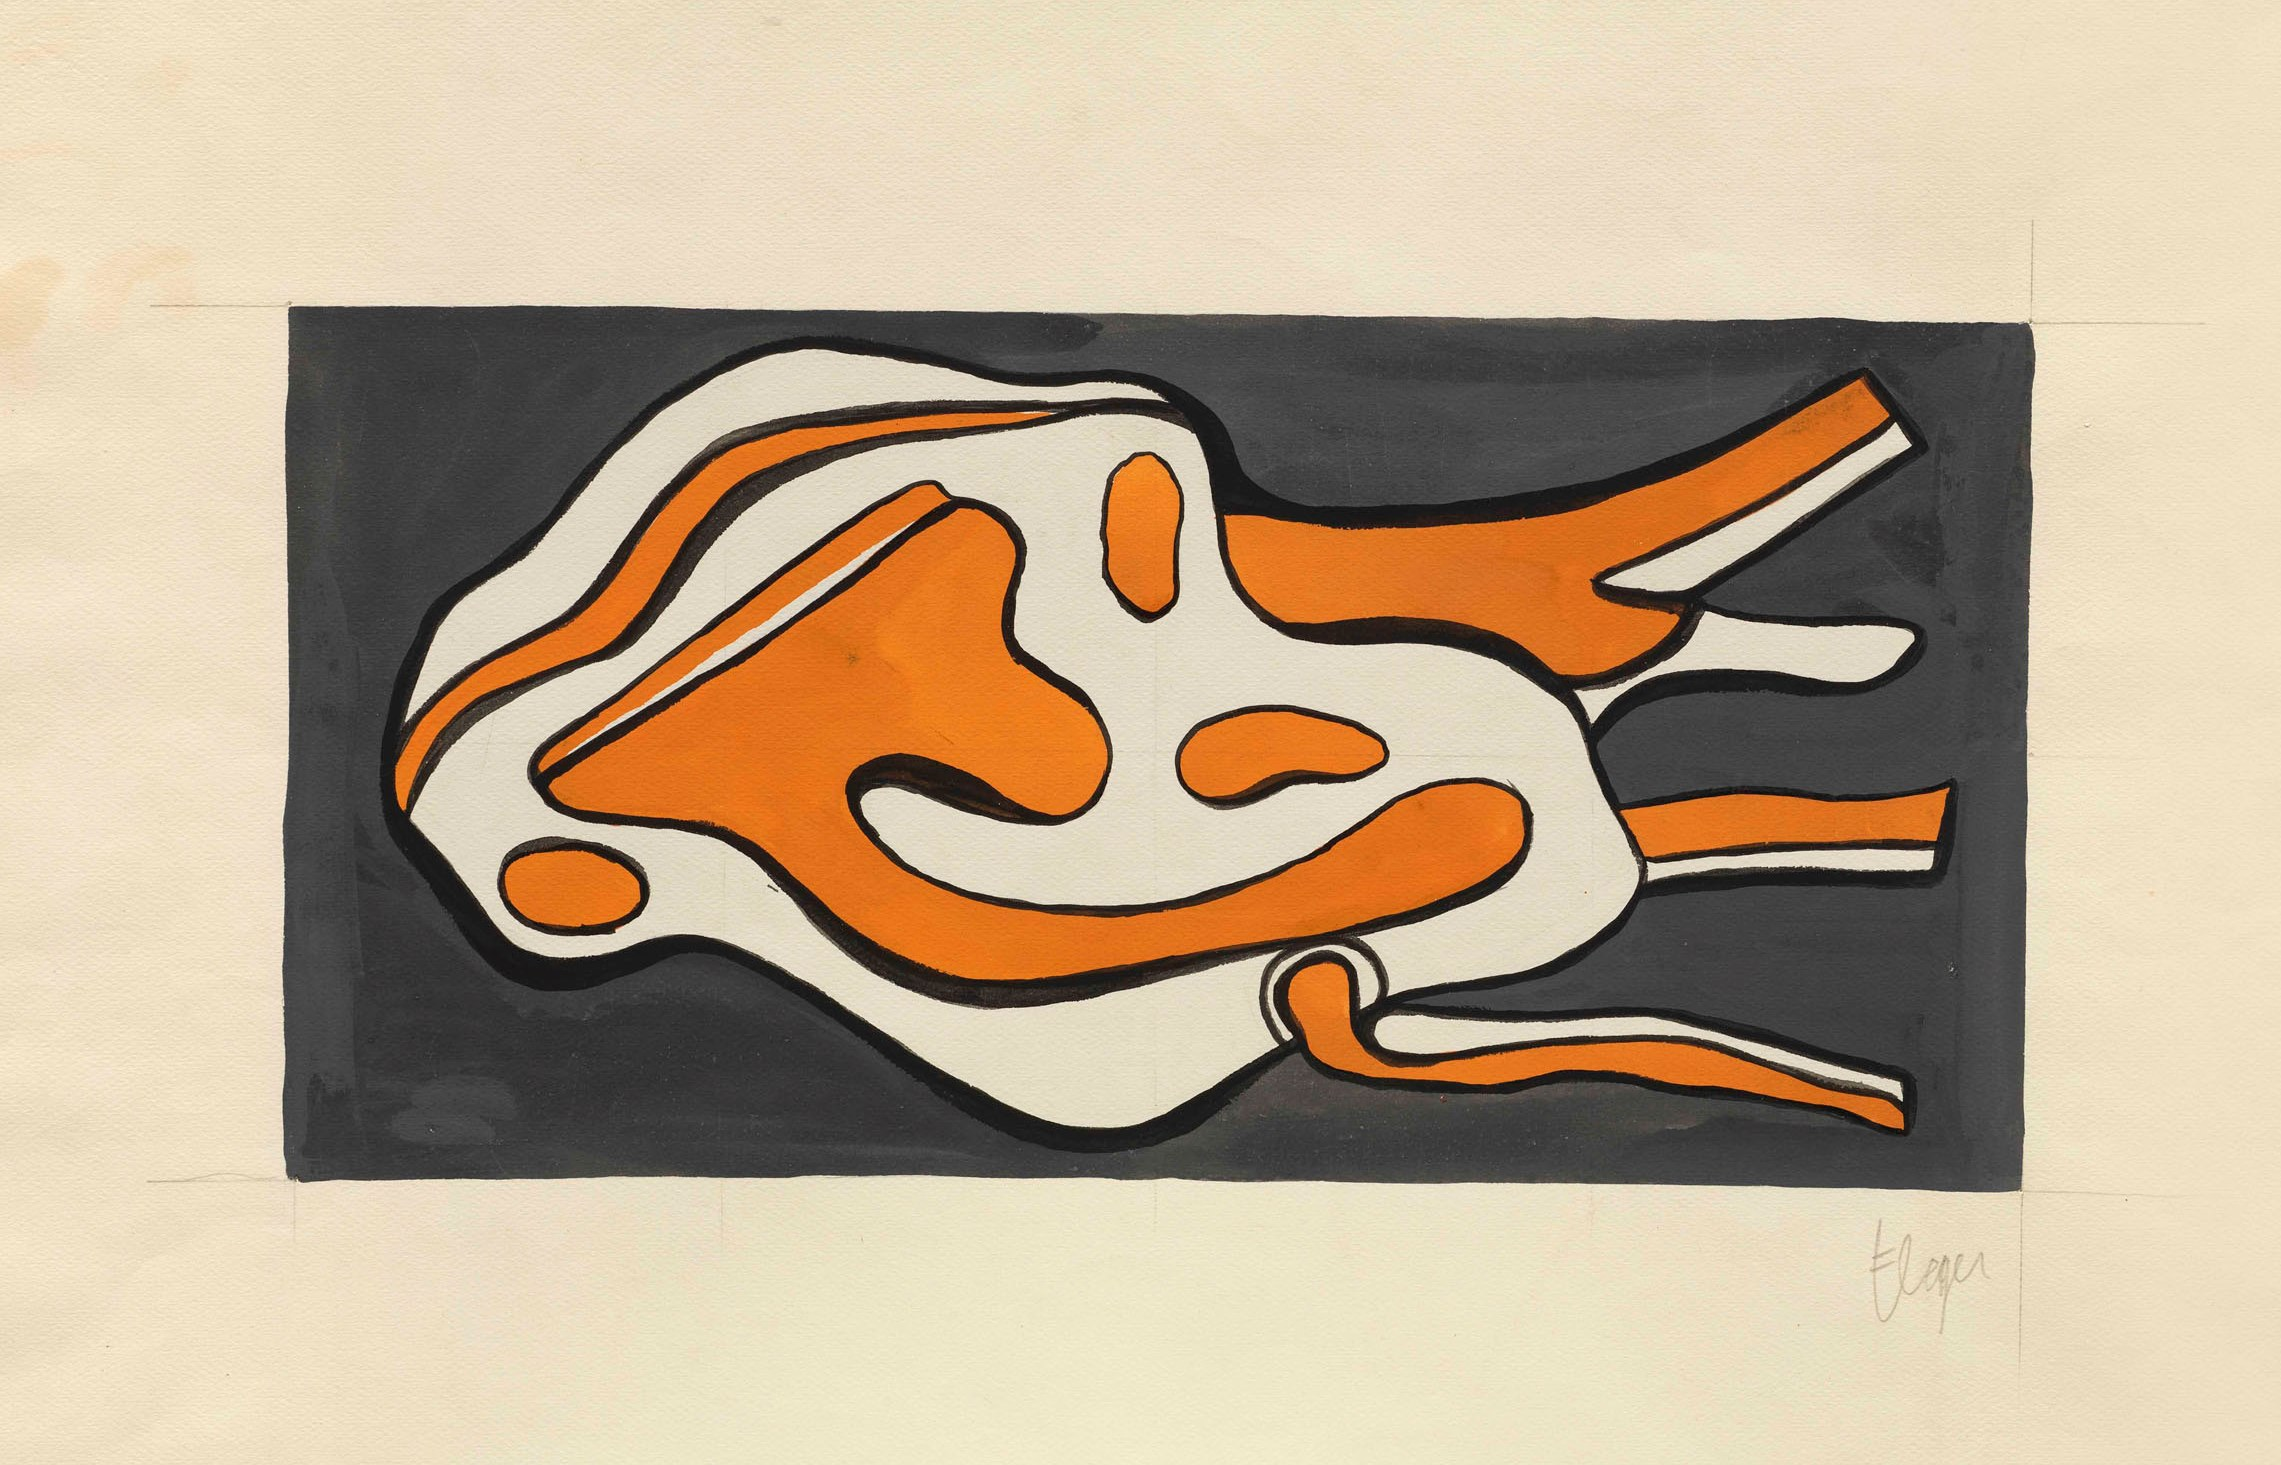 ONU (estudio),por Fernand Léger, 1951, gouache sobre papel, 22 x 44 cm, firmado y titulado.